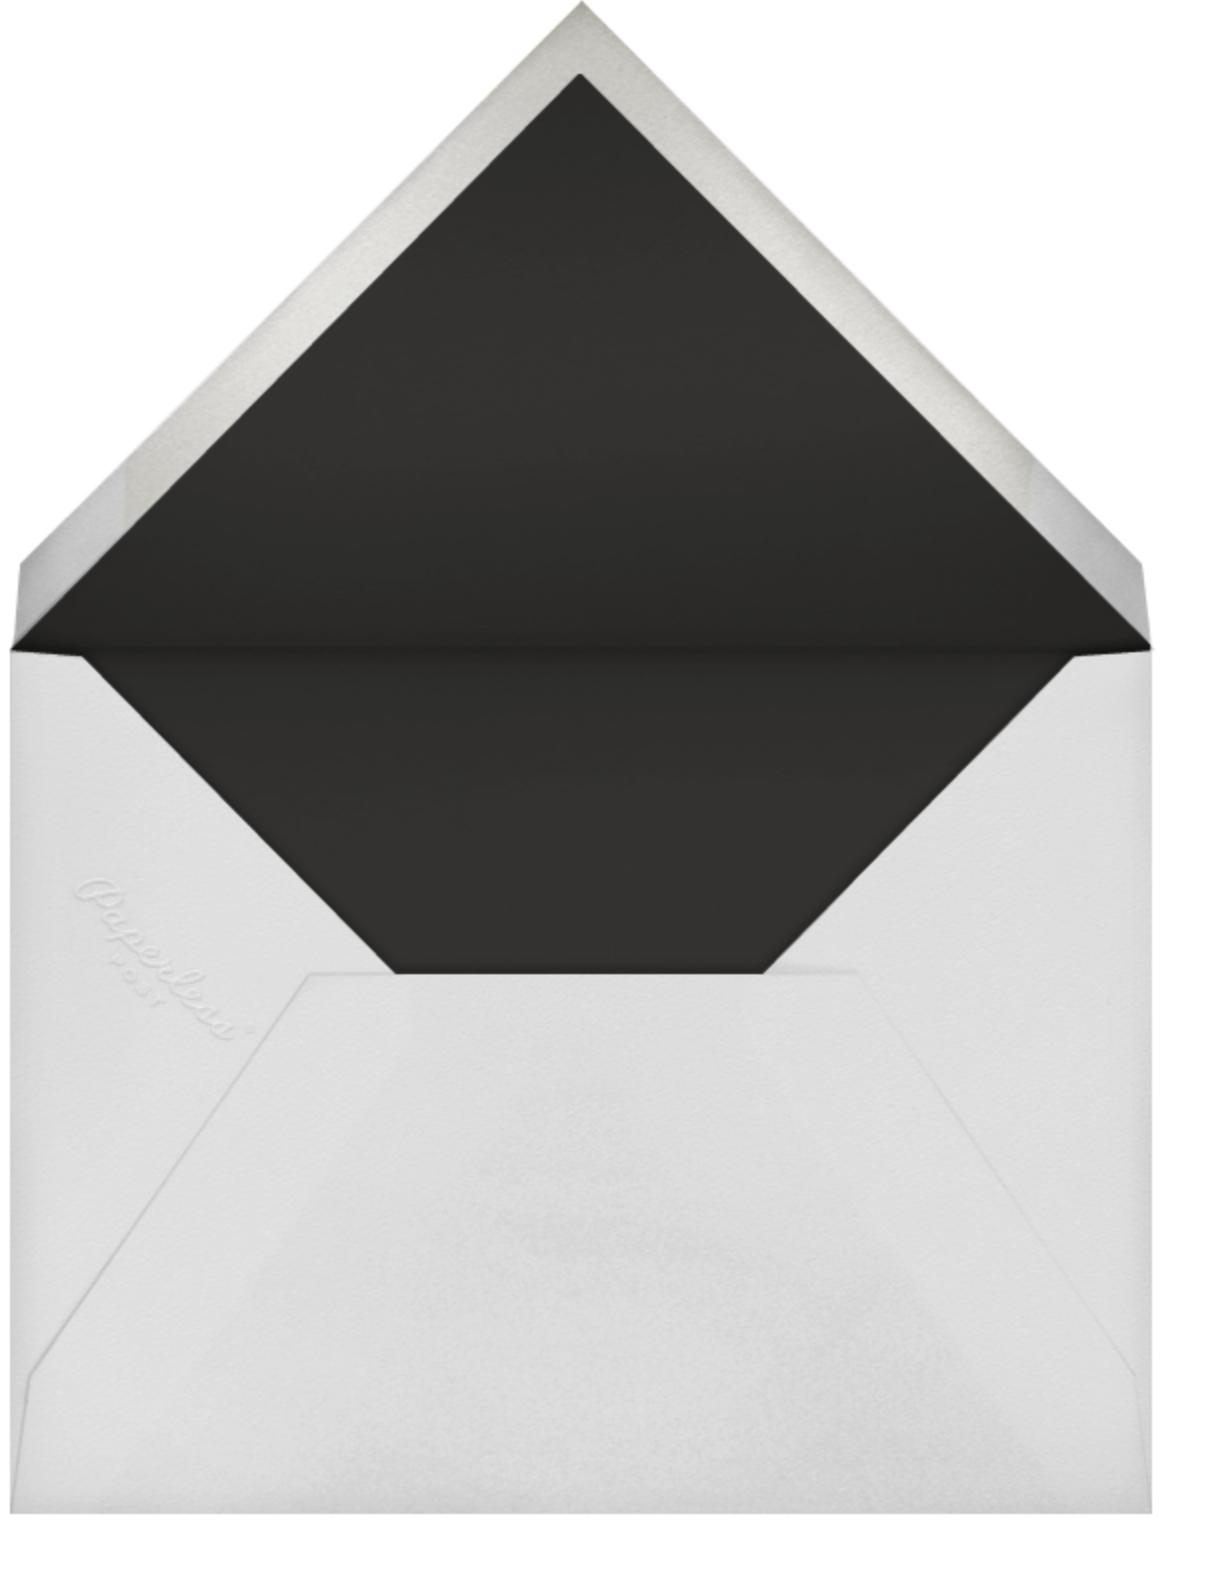 Floral Trellis II (Photo Stationery) - Gold - Oscar de la Renta - Wedding  - envelope back